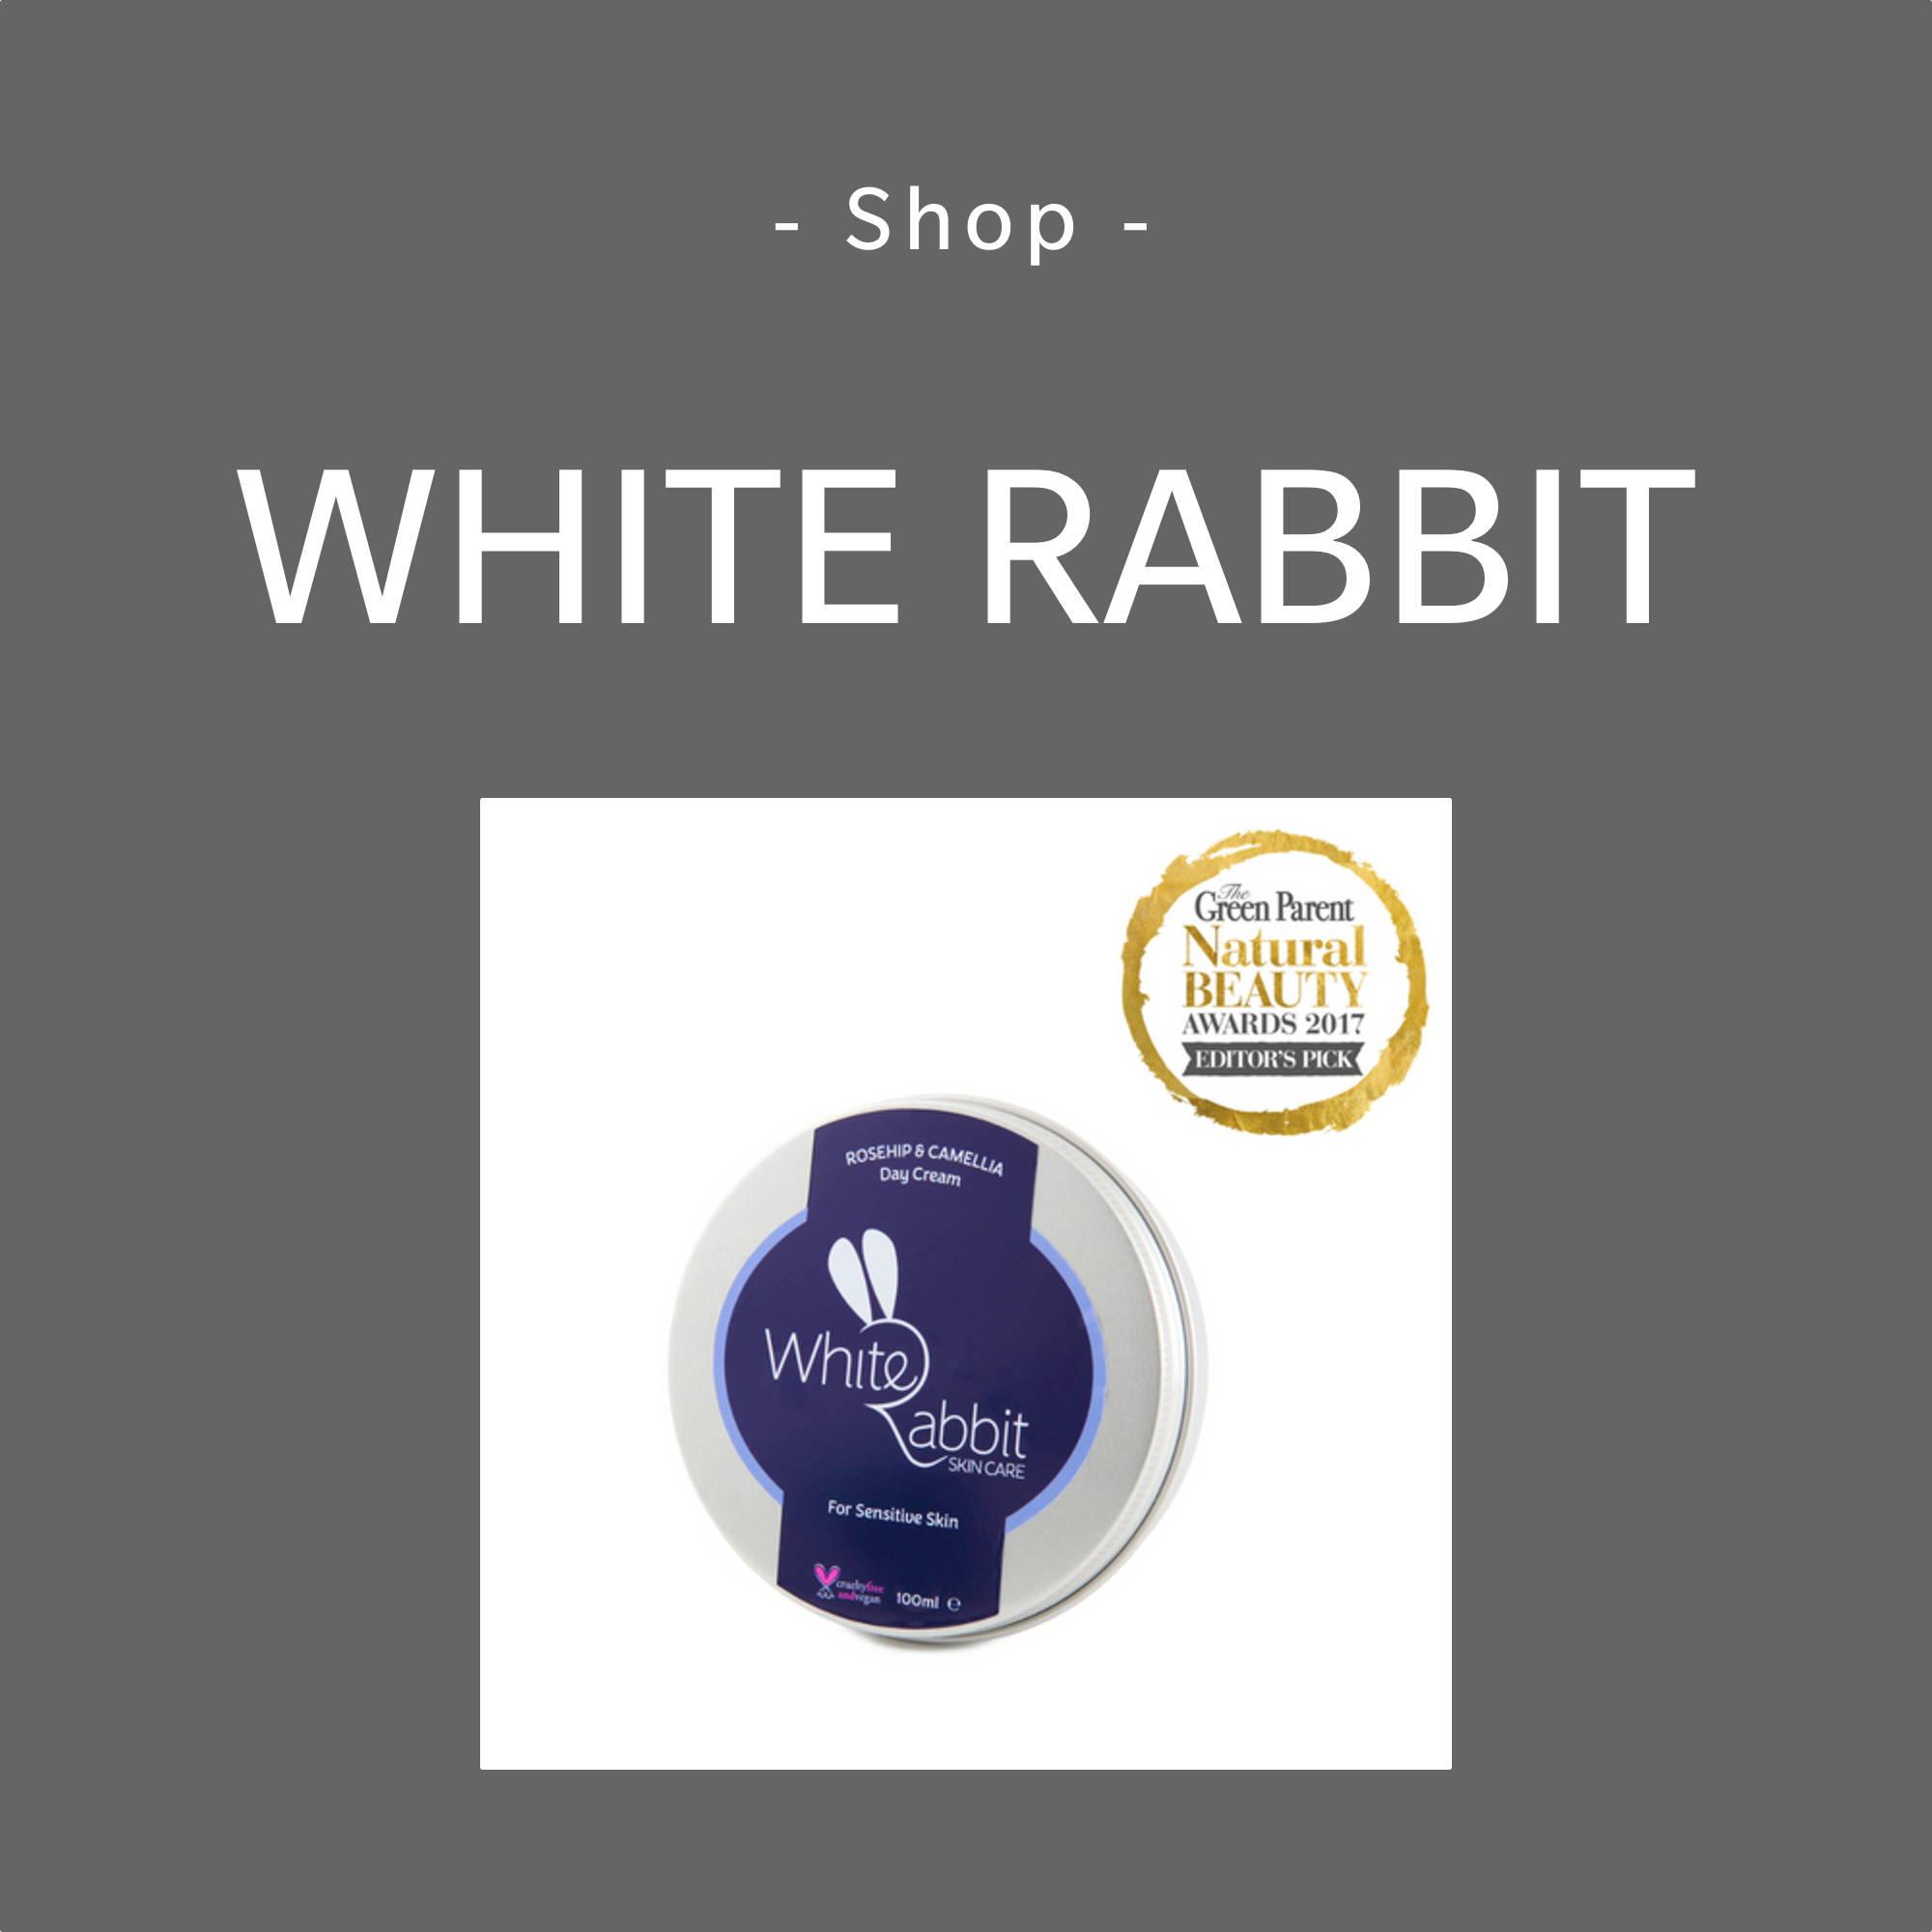 White Rabbit Skincare Brand Page